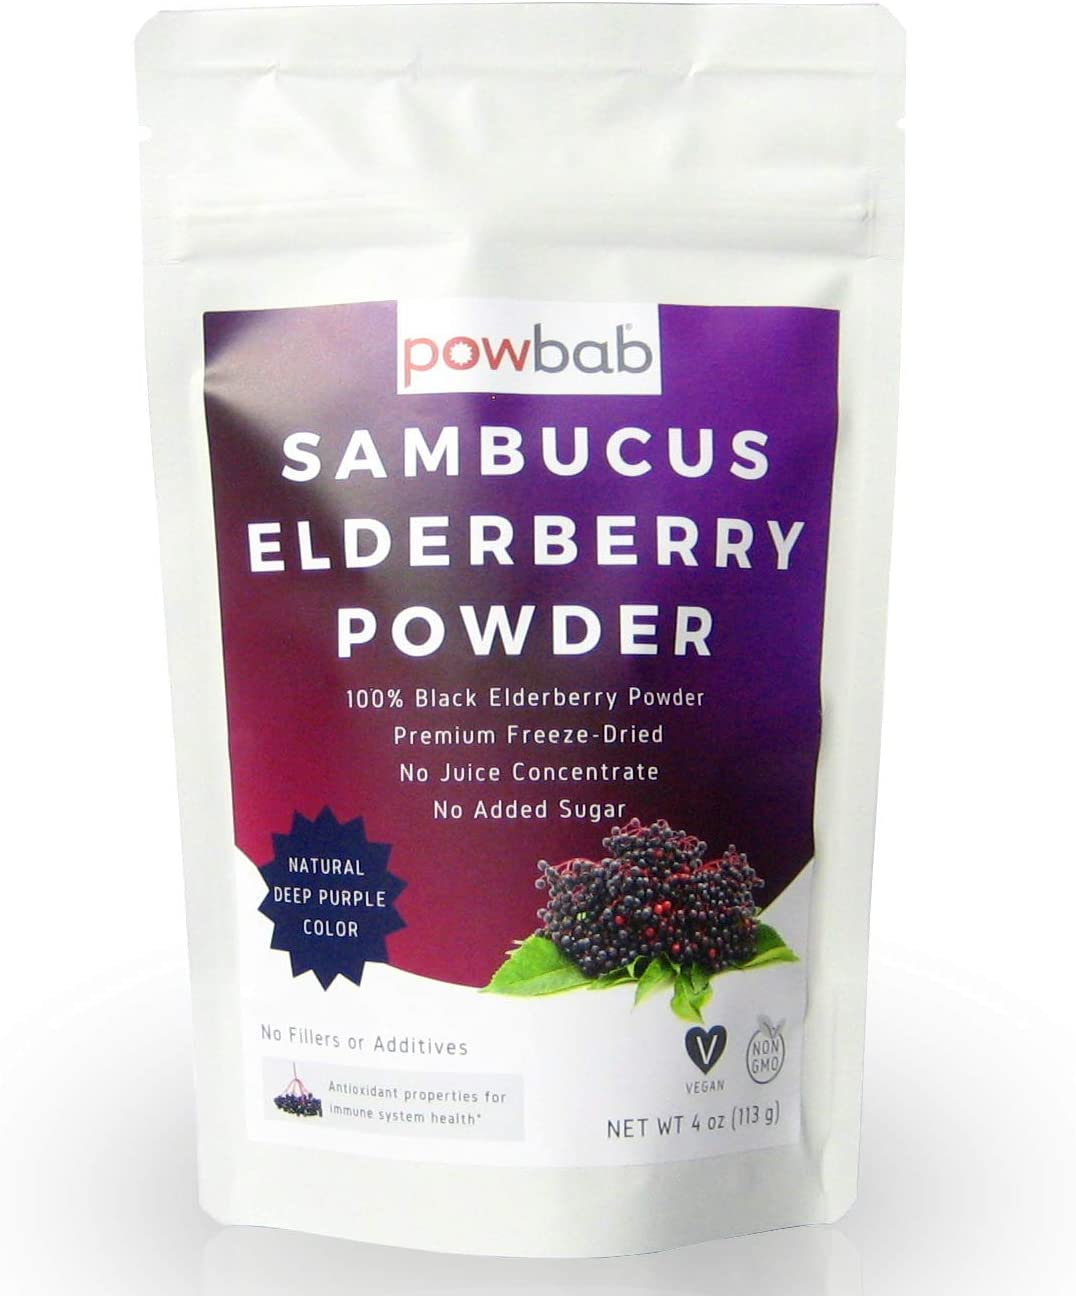 powbab Sambucus Elderberry Powder from 100% Freeze-Dried Organic Elderberries, Chilean (4 oz). No Juice Concentrate, No Sugar Added, No Fillers. immune System Boost - Cold Symptoms, Circulation Health